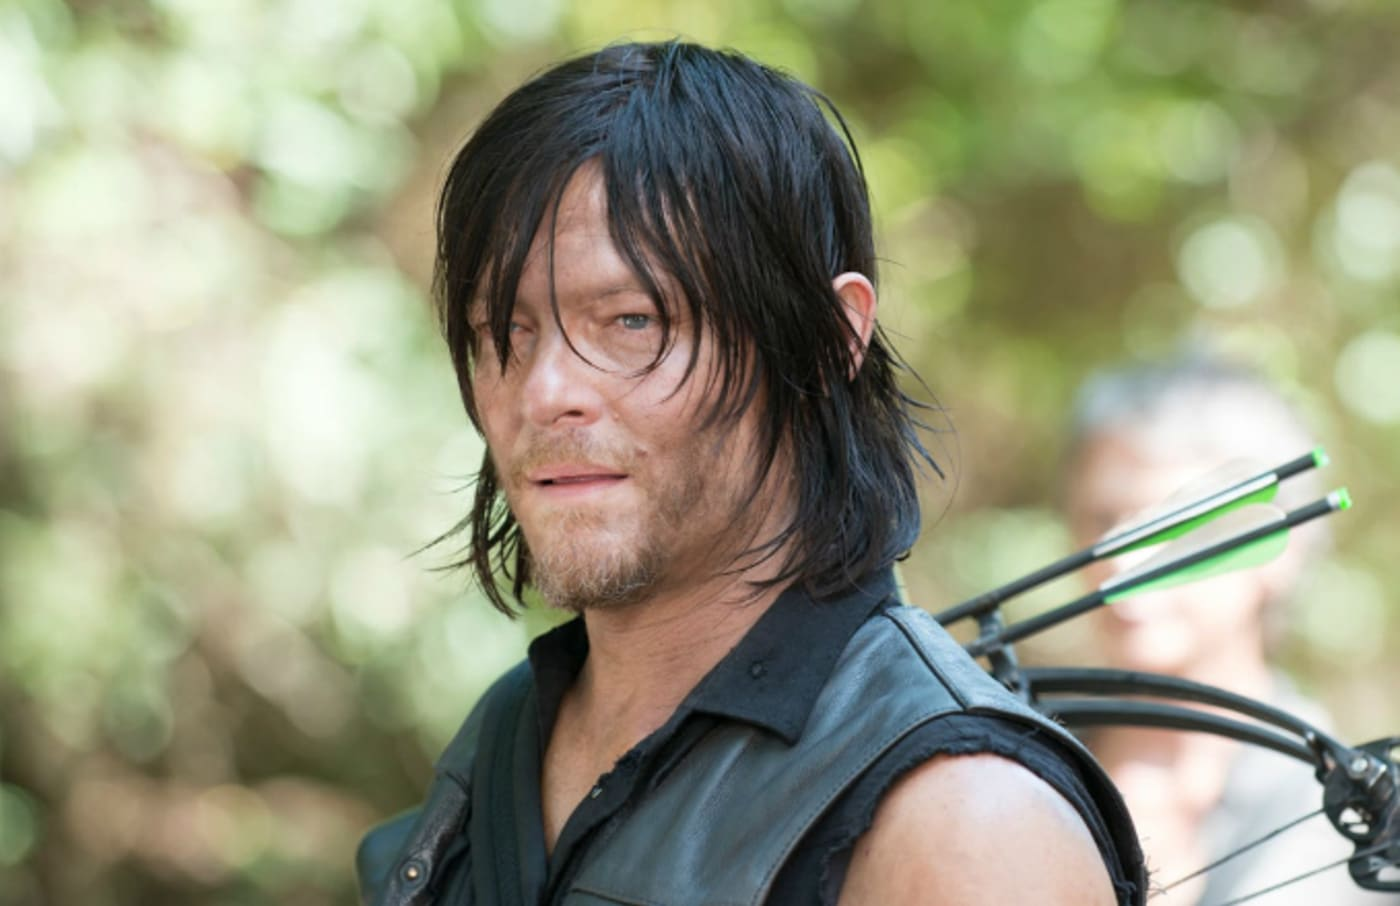 Norman Reedus on 'The Walking Dead'